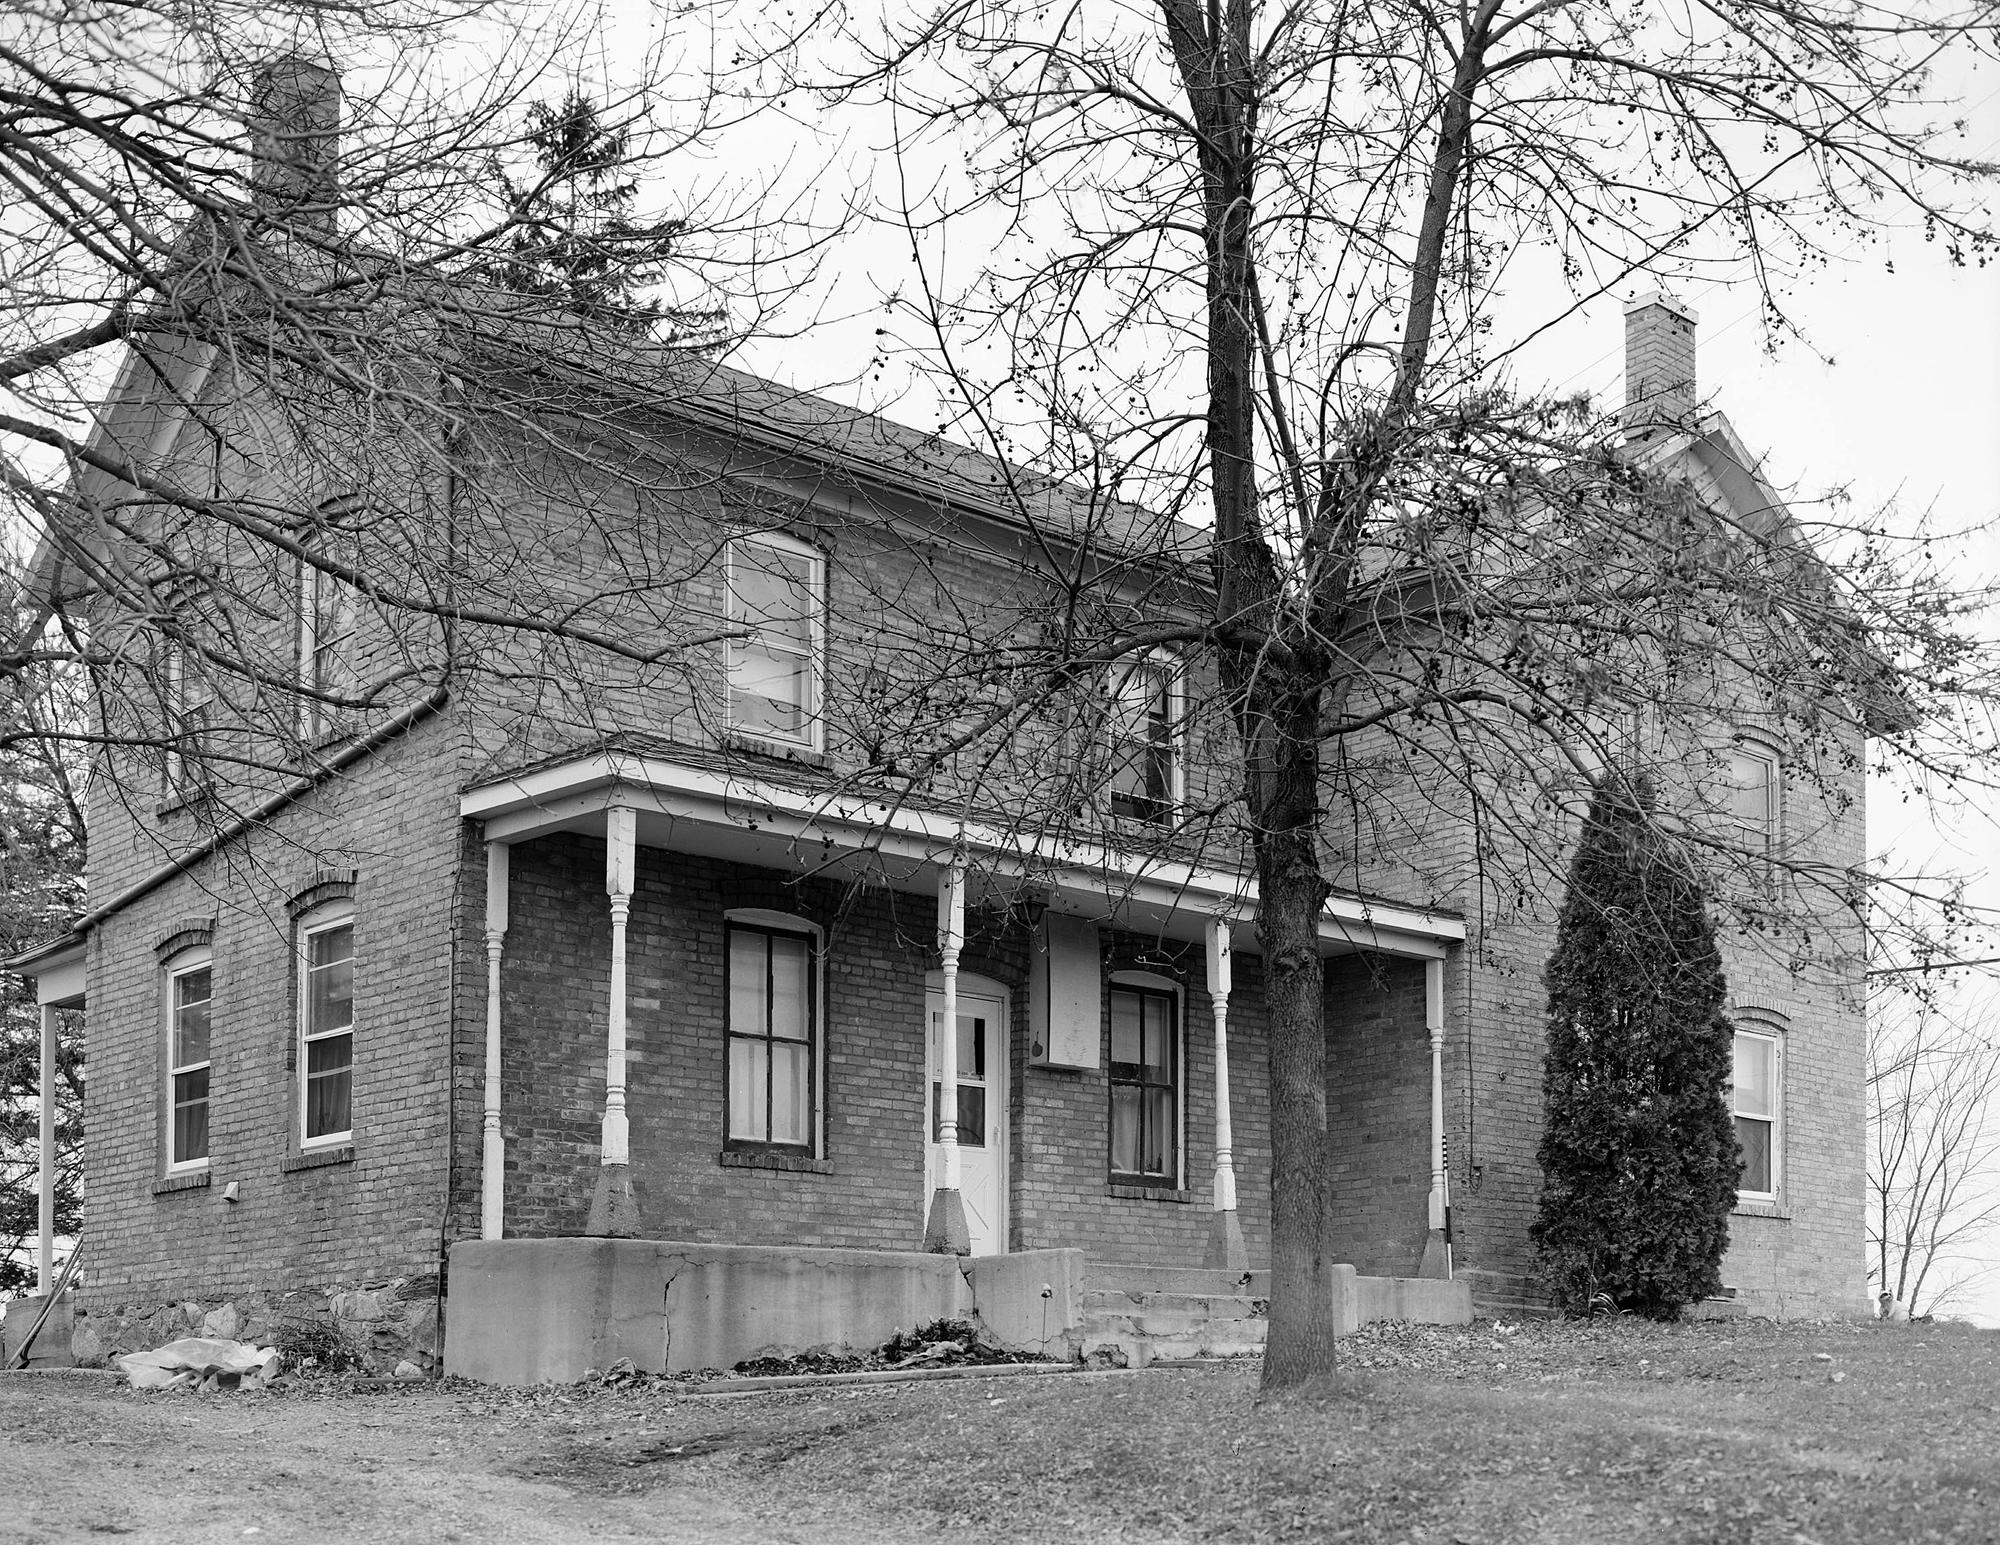 Main Elevation Oblique - MHPR CR-DHL-009-06 (Please credit Daniel R. Pratt and the Minnesota Historic Property Record)